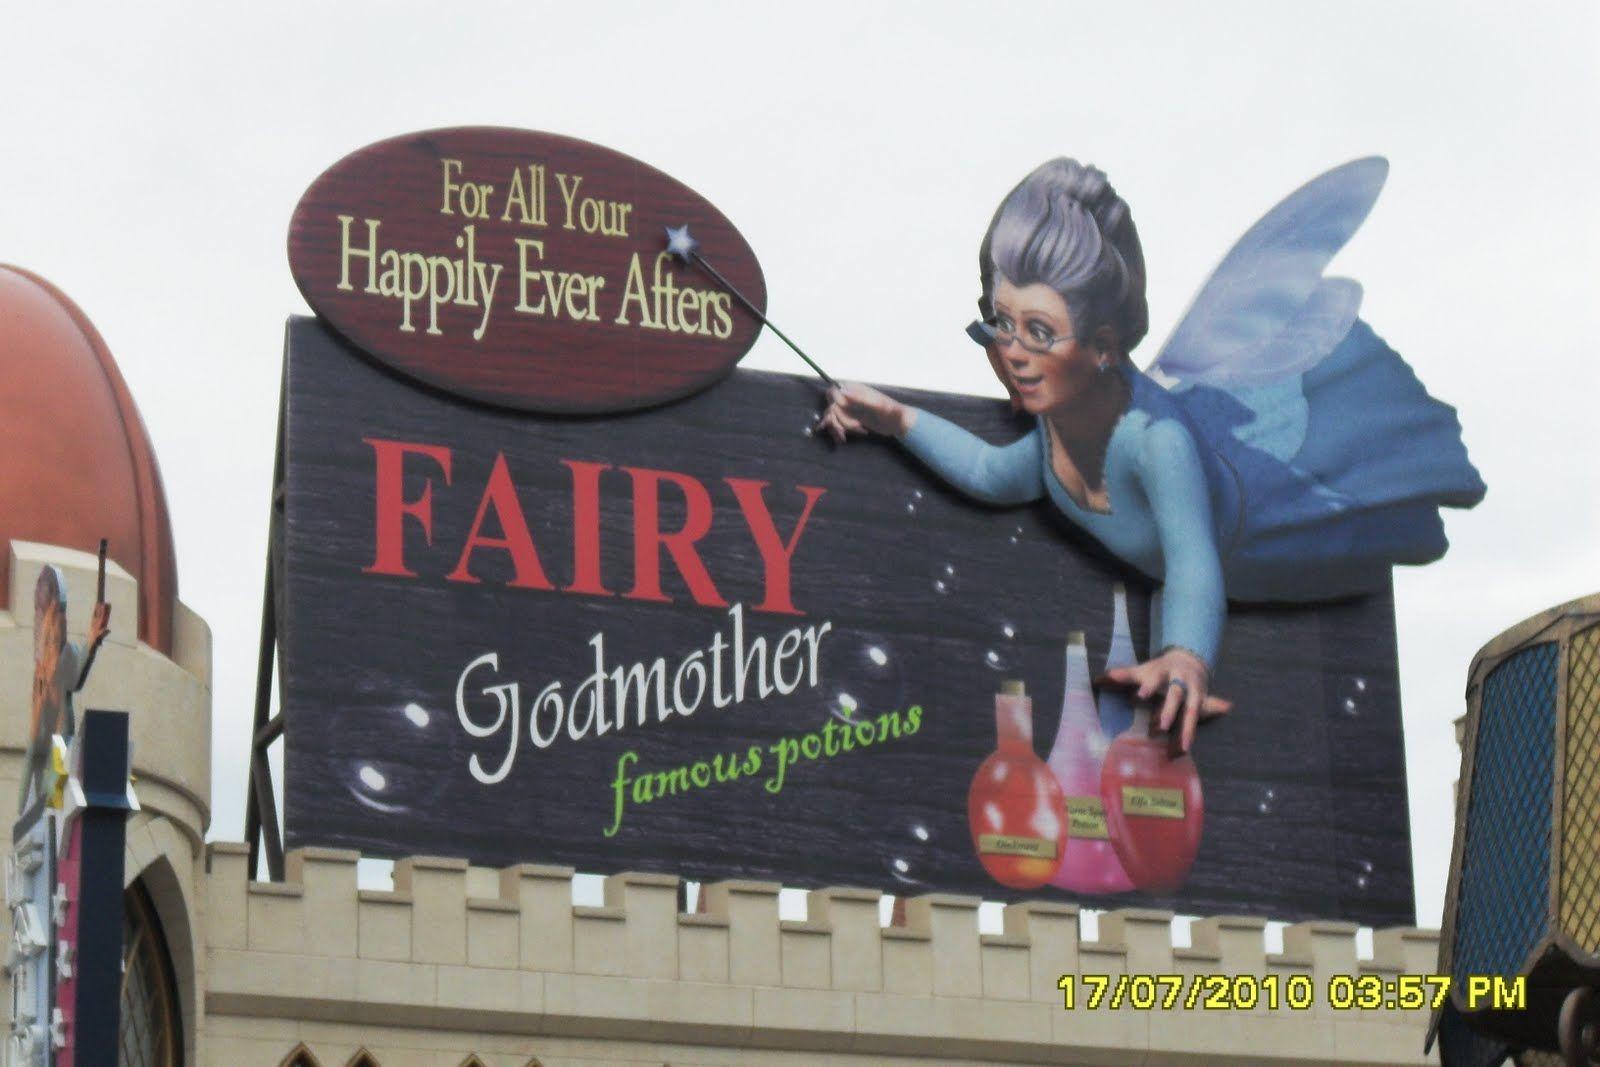 Shrek 2 Fairy Godmother Shrek Fairy Godmother Pictures